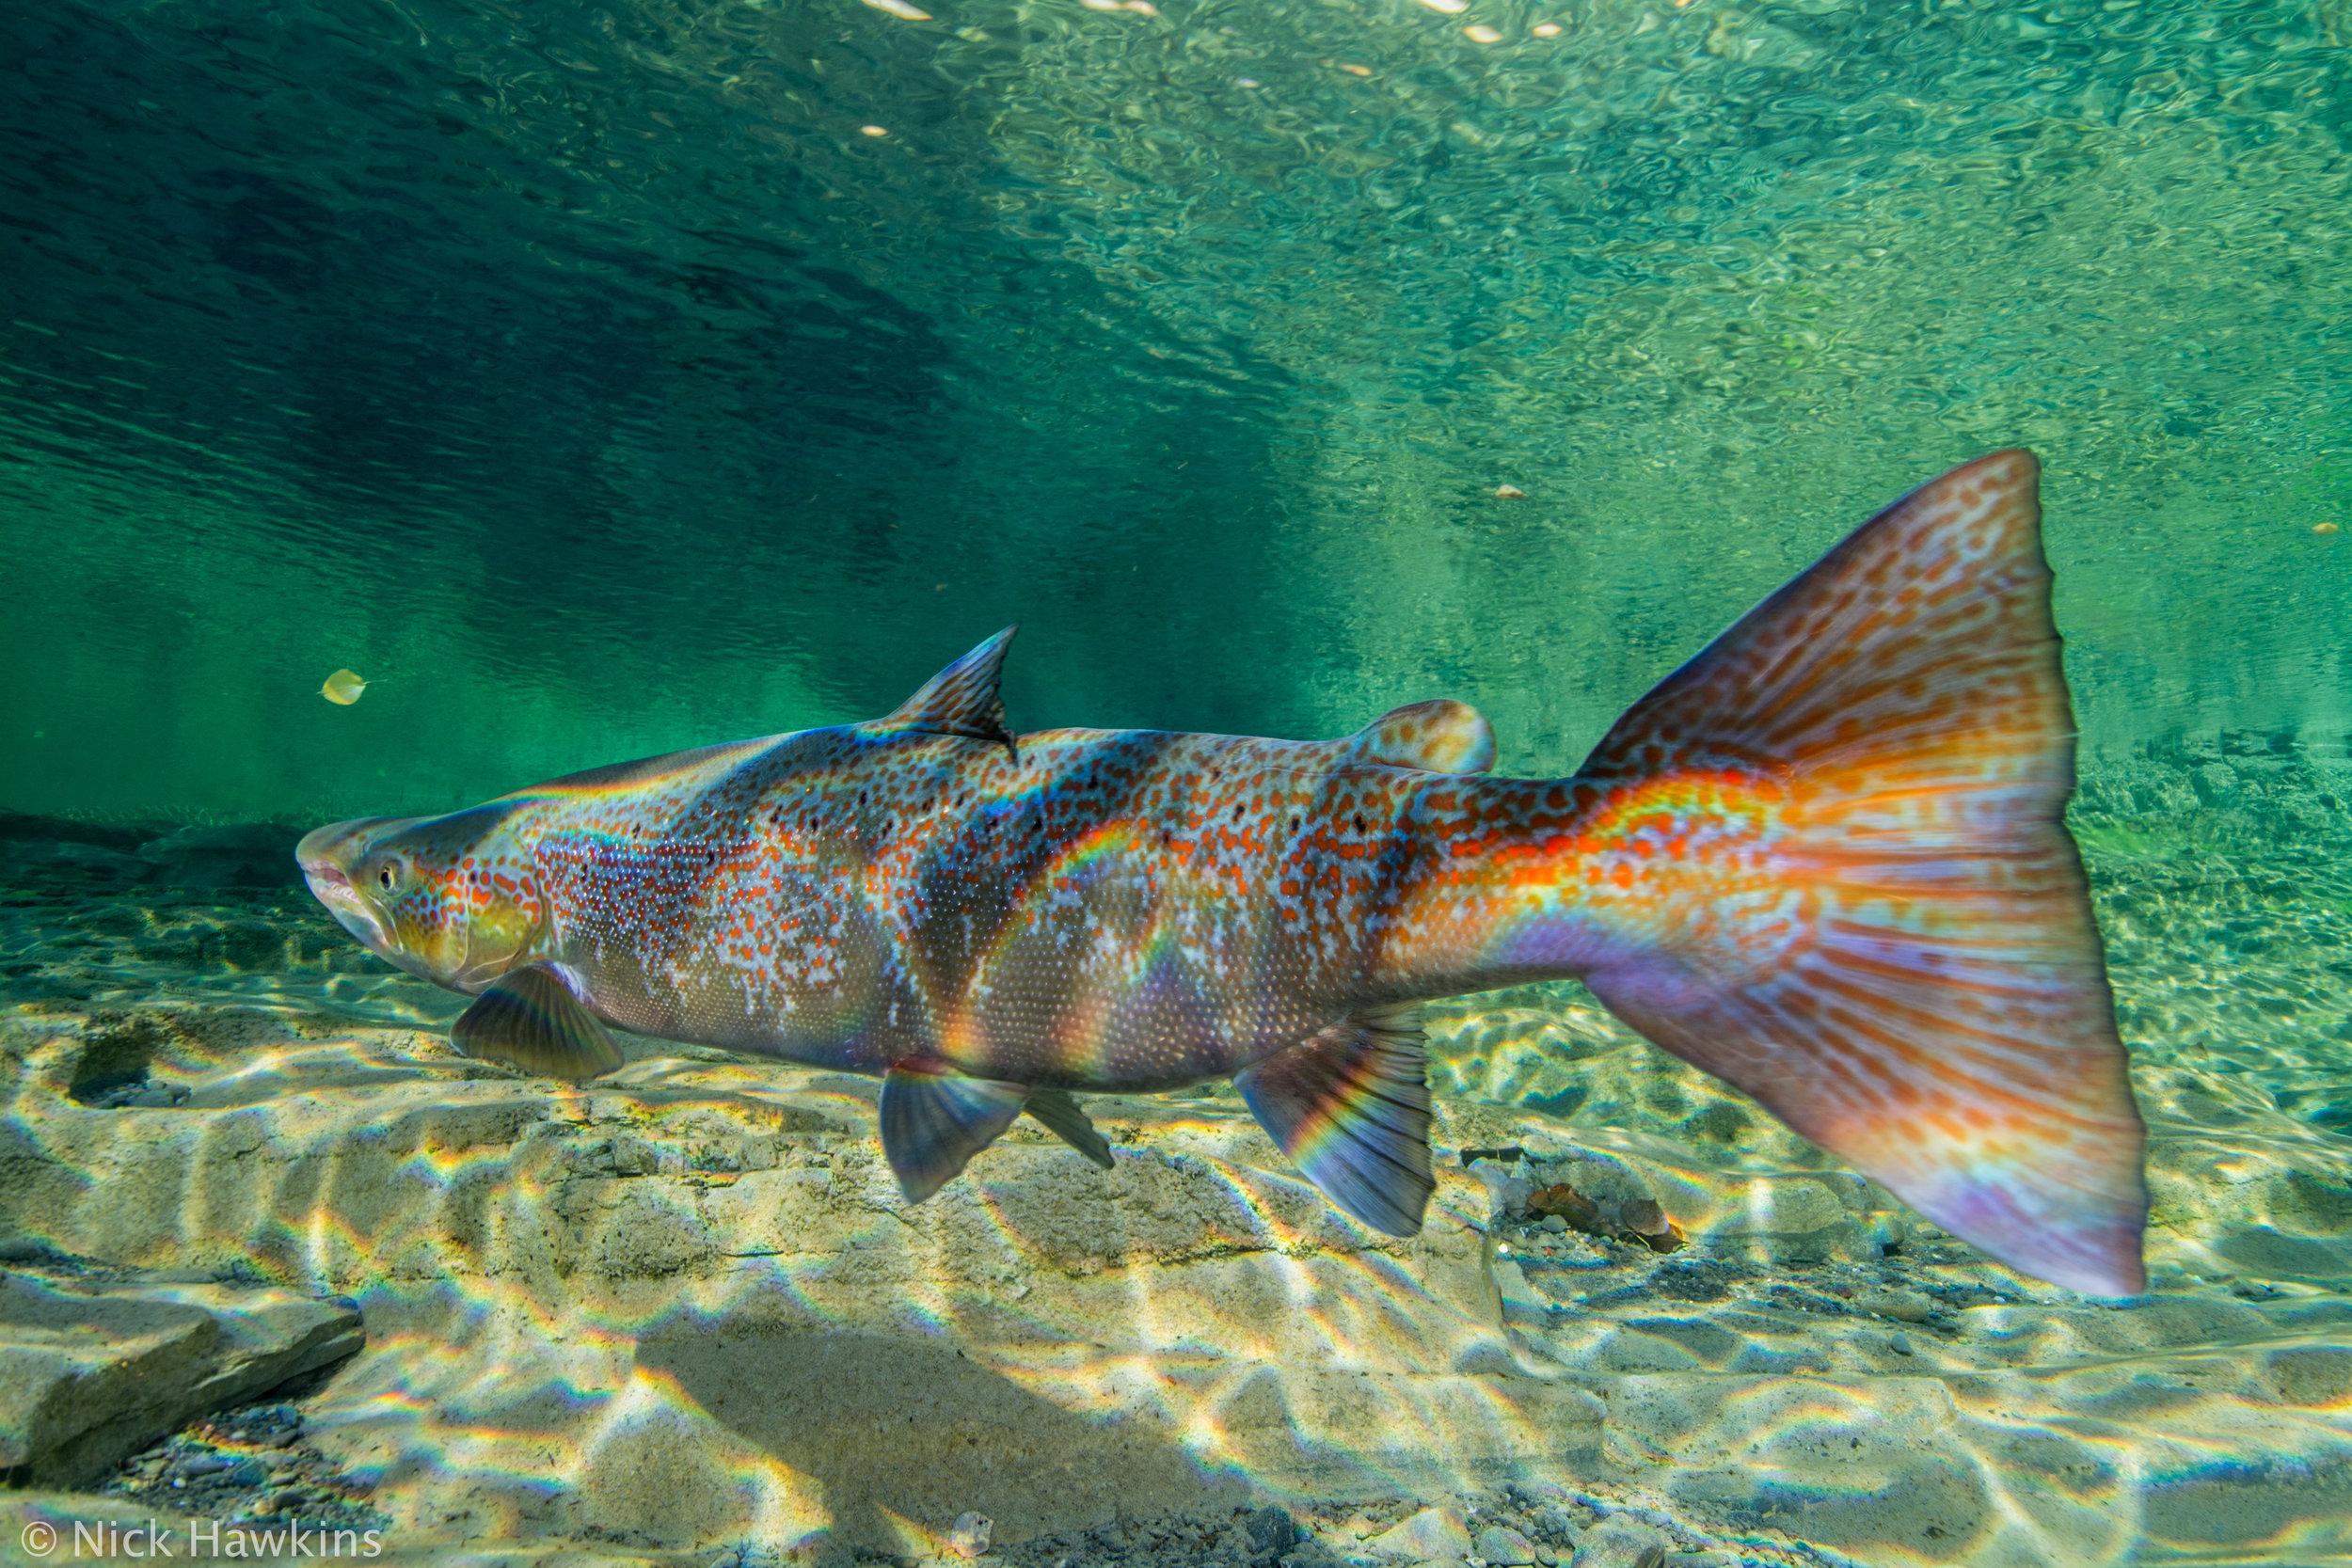 Gaspé-Saving-Salmon-Nick-Hawkins-3991.jpg